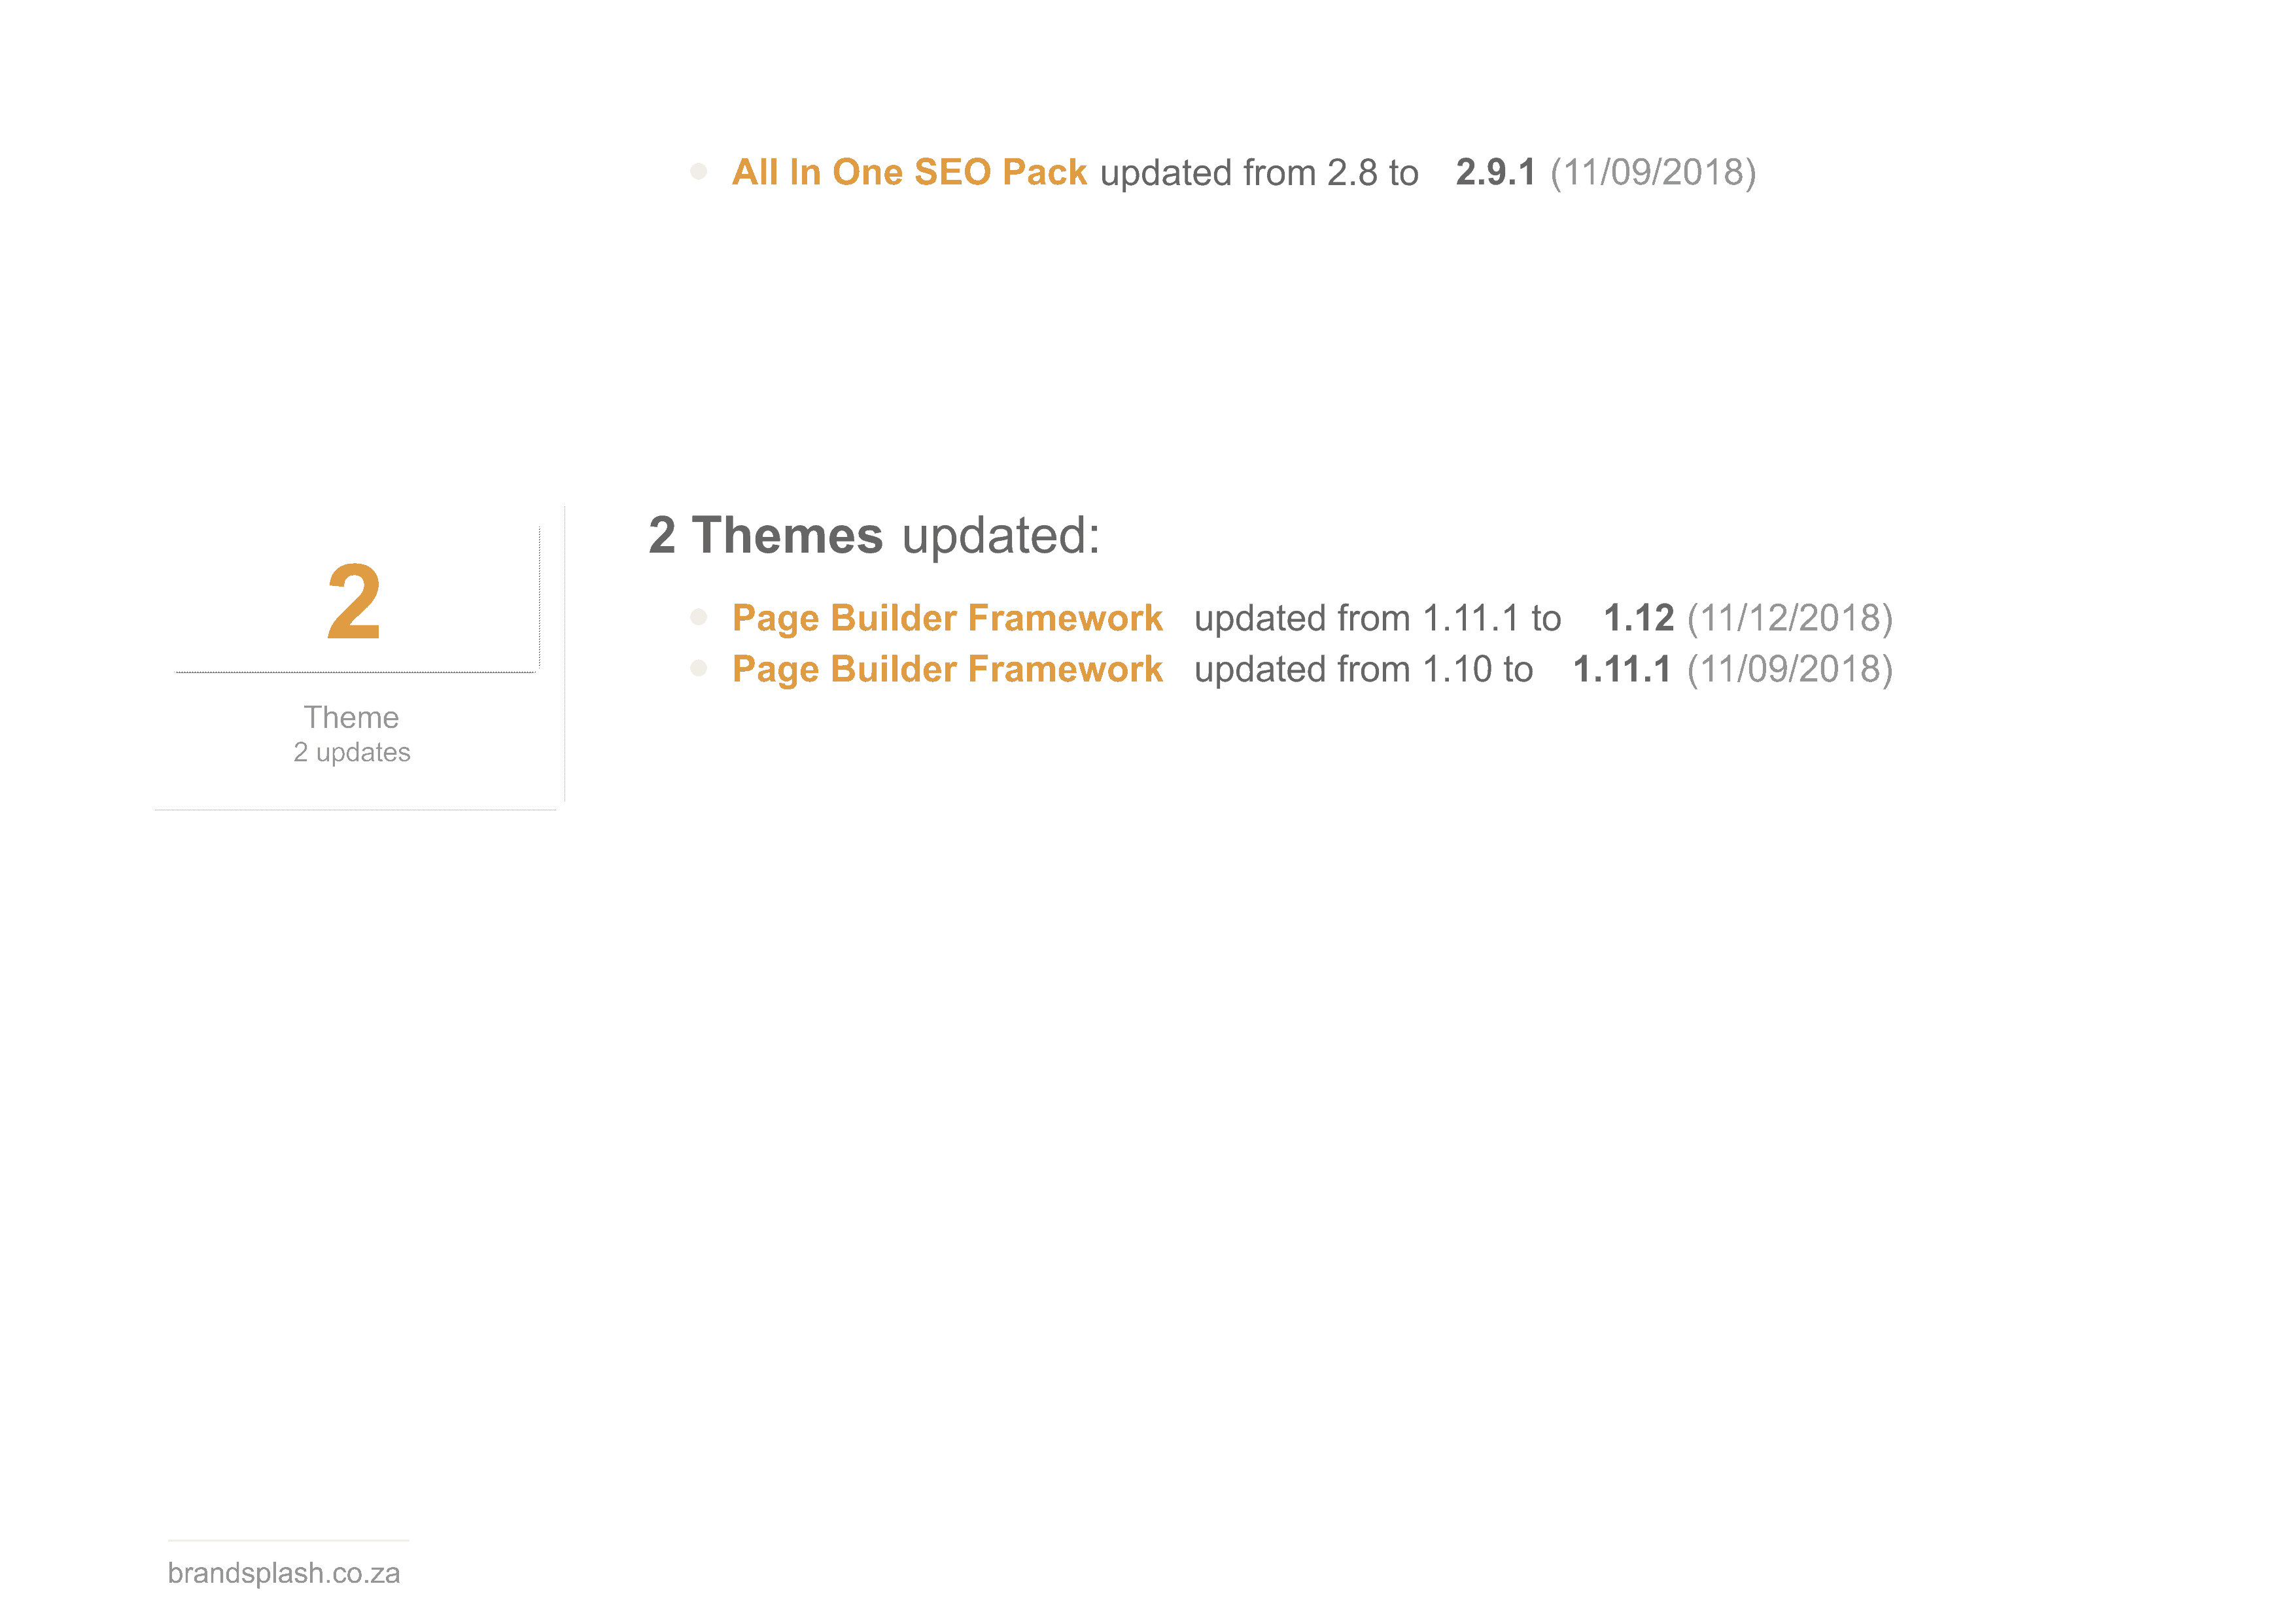 Website maintenance updates